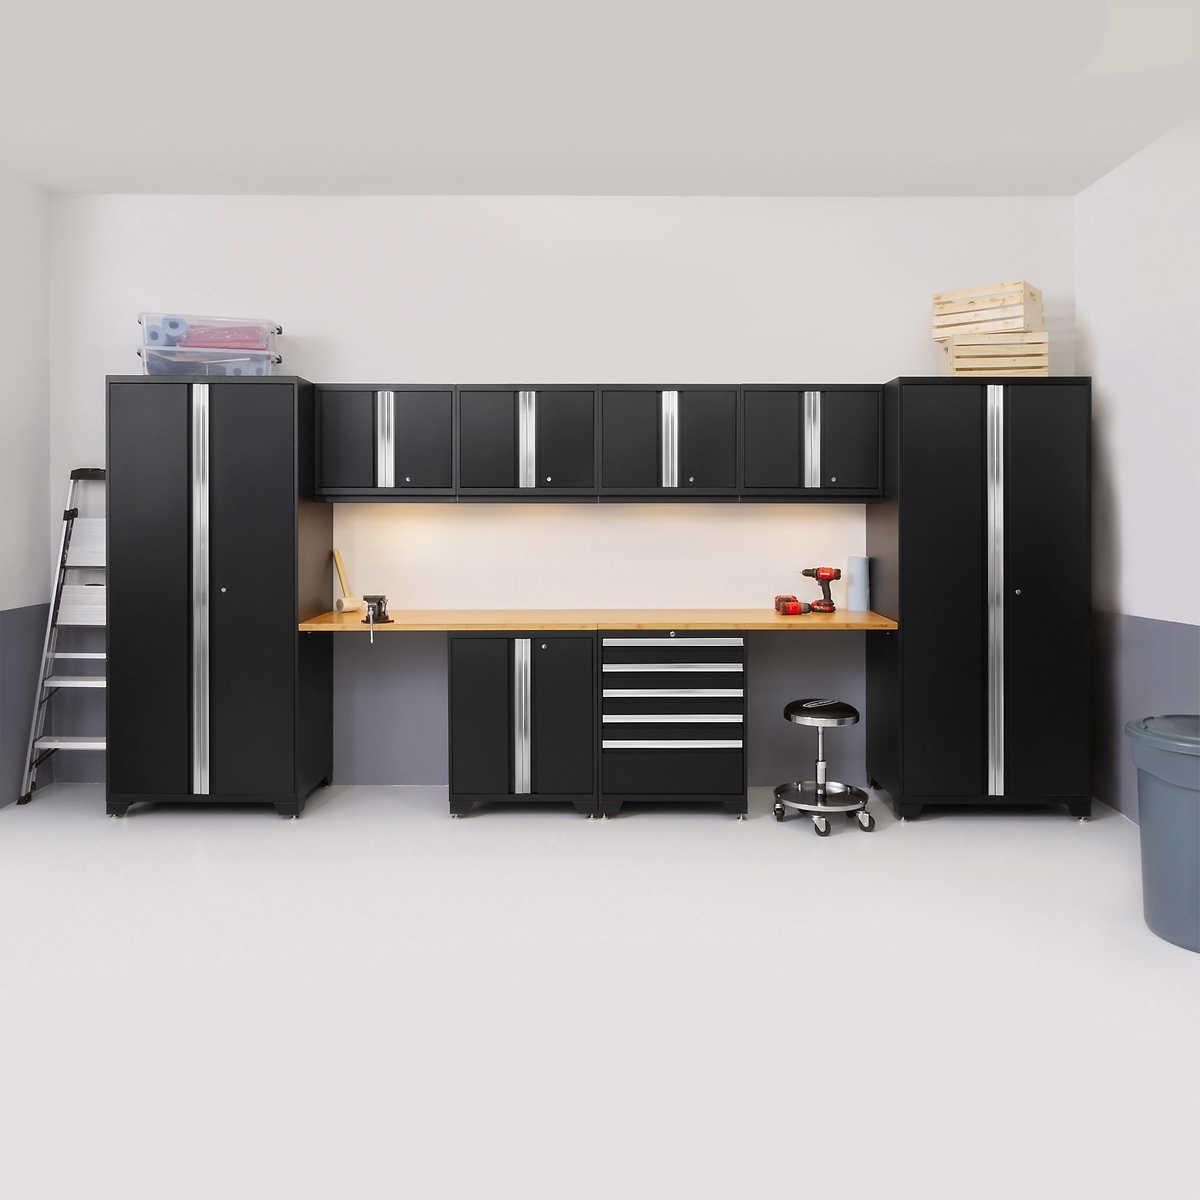 New Age Performance Cabinets Costco Mf Cabinets